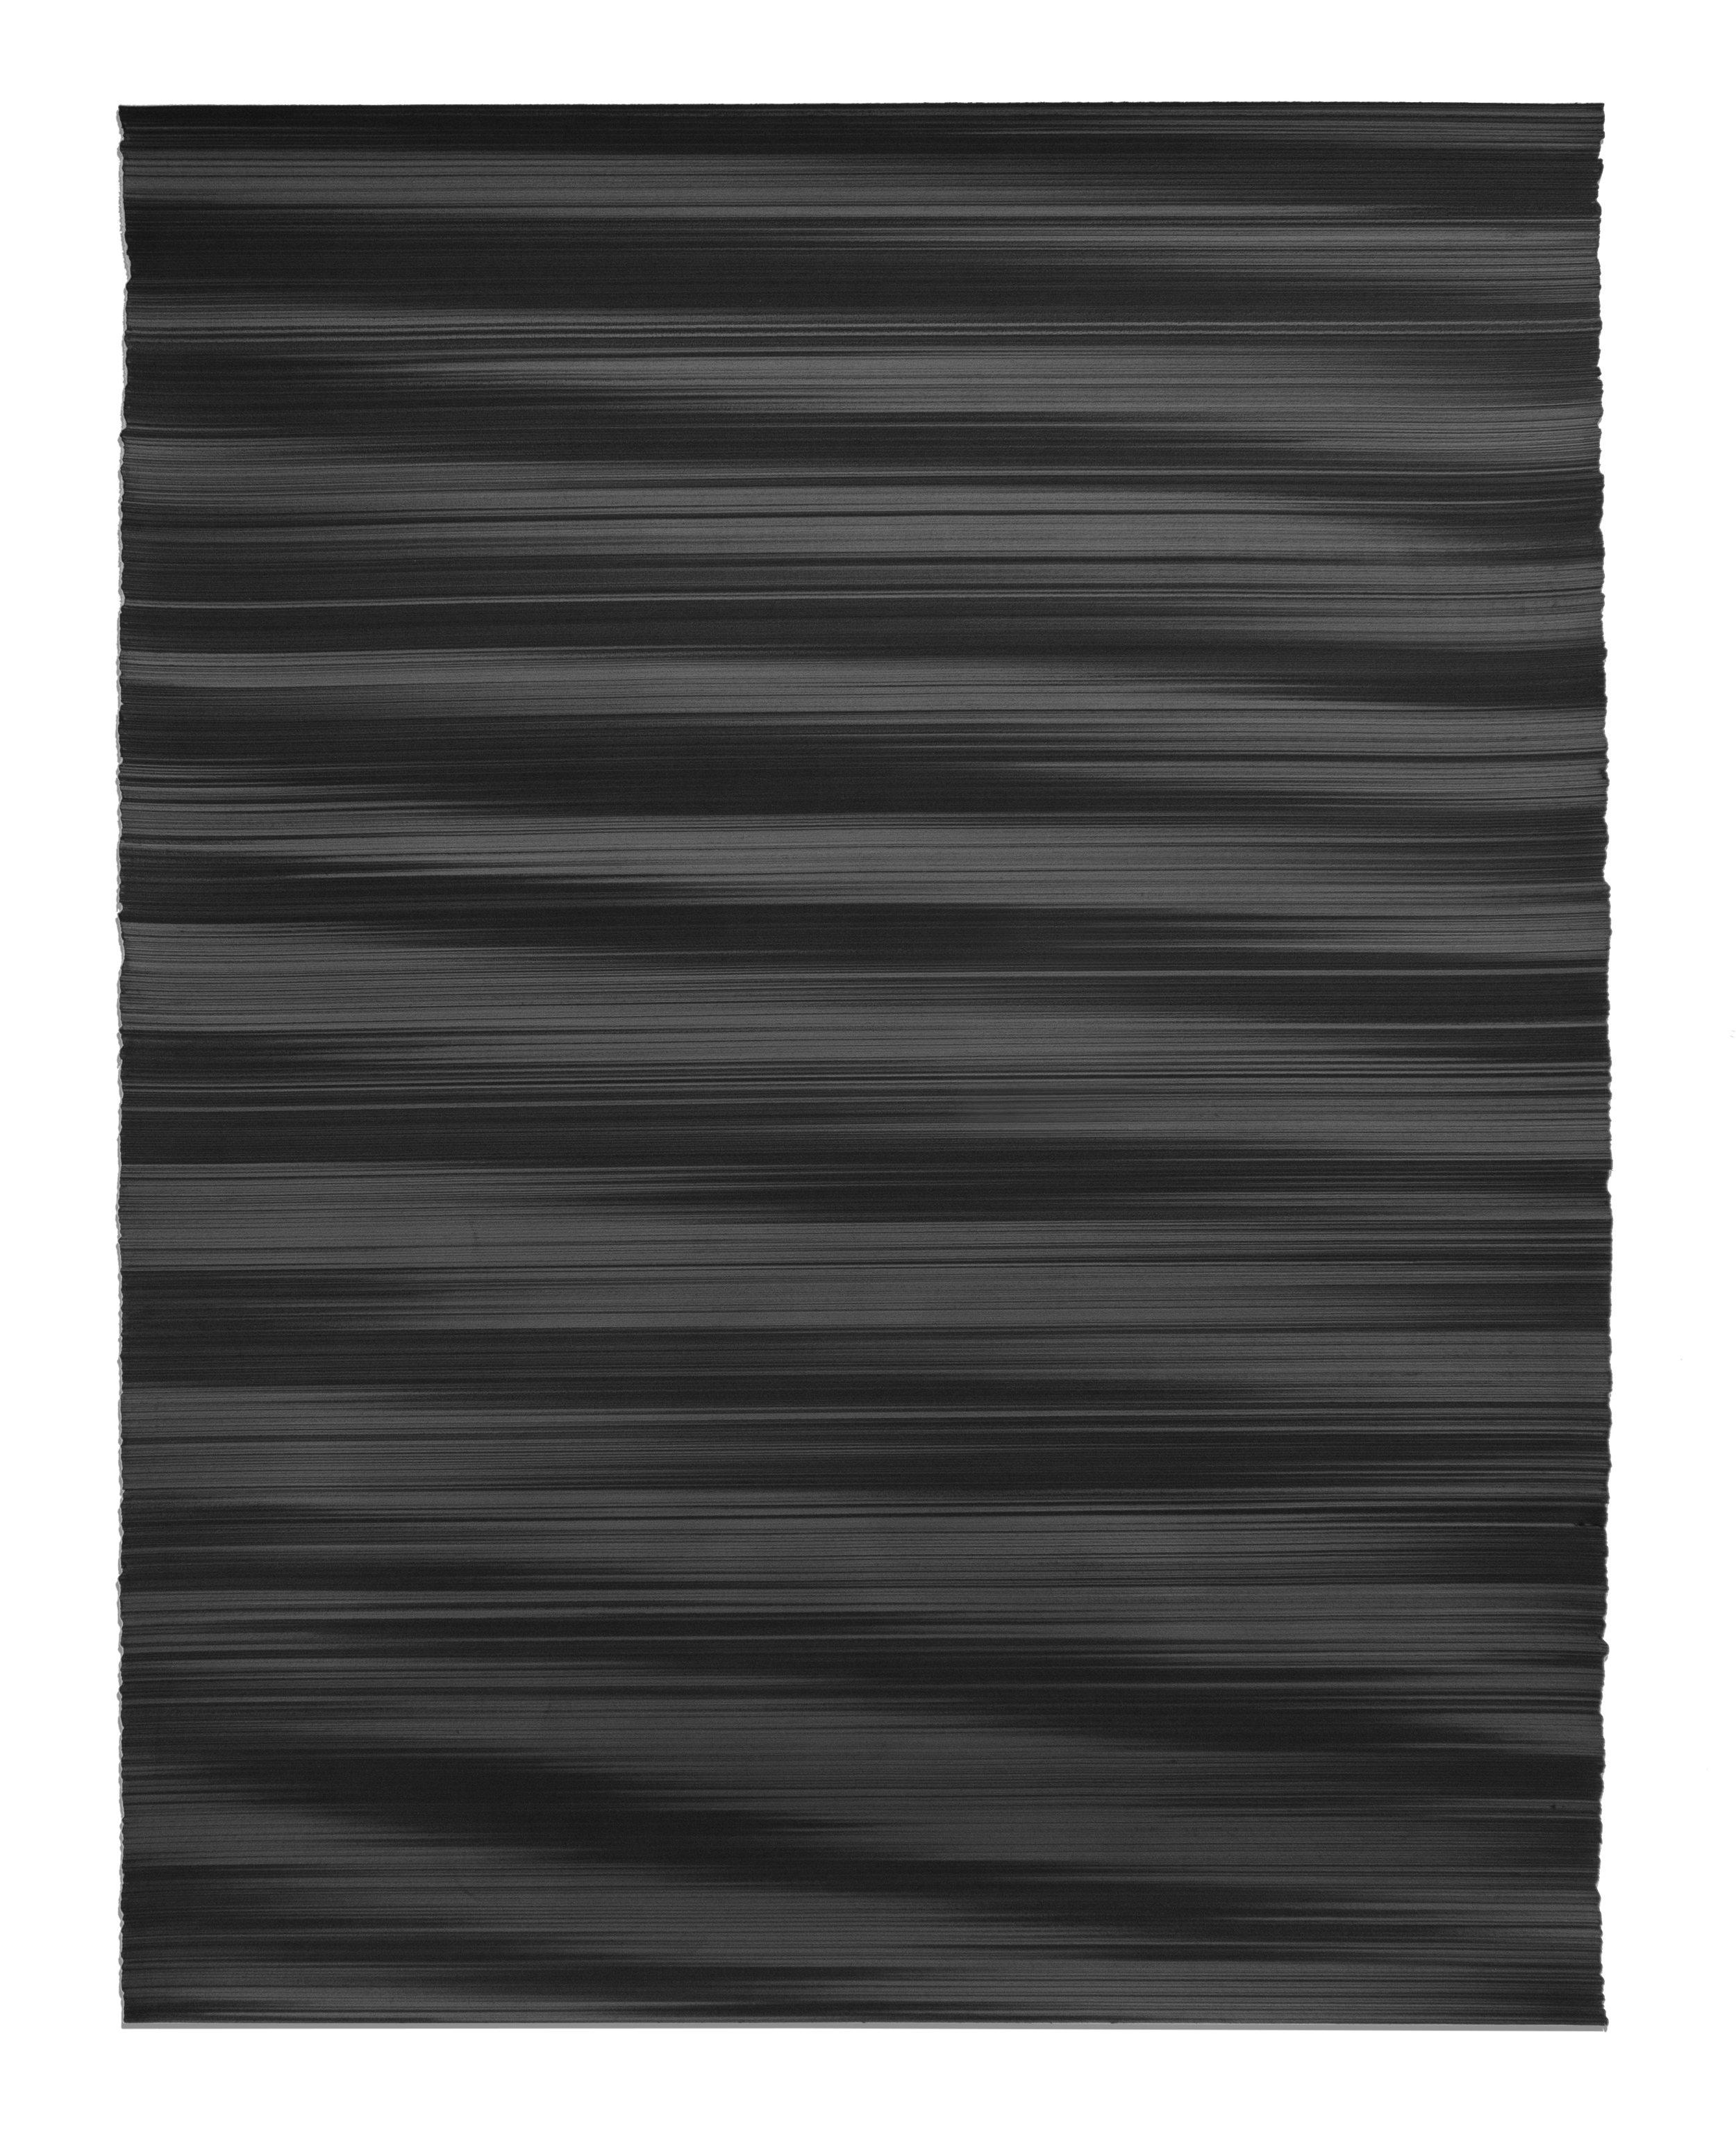 Waves in Black No. 1